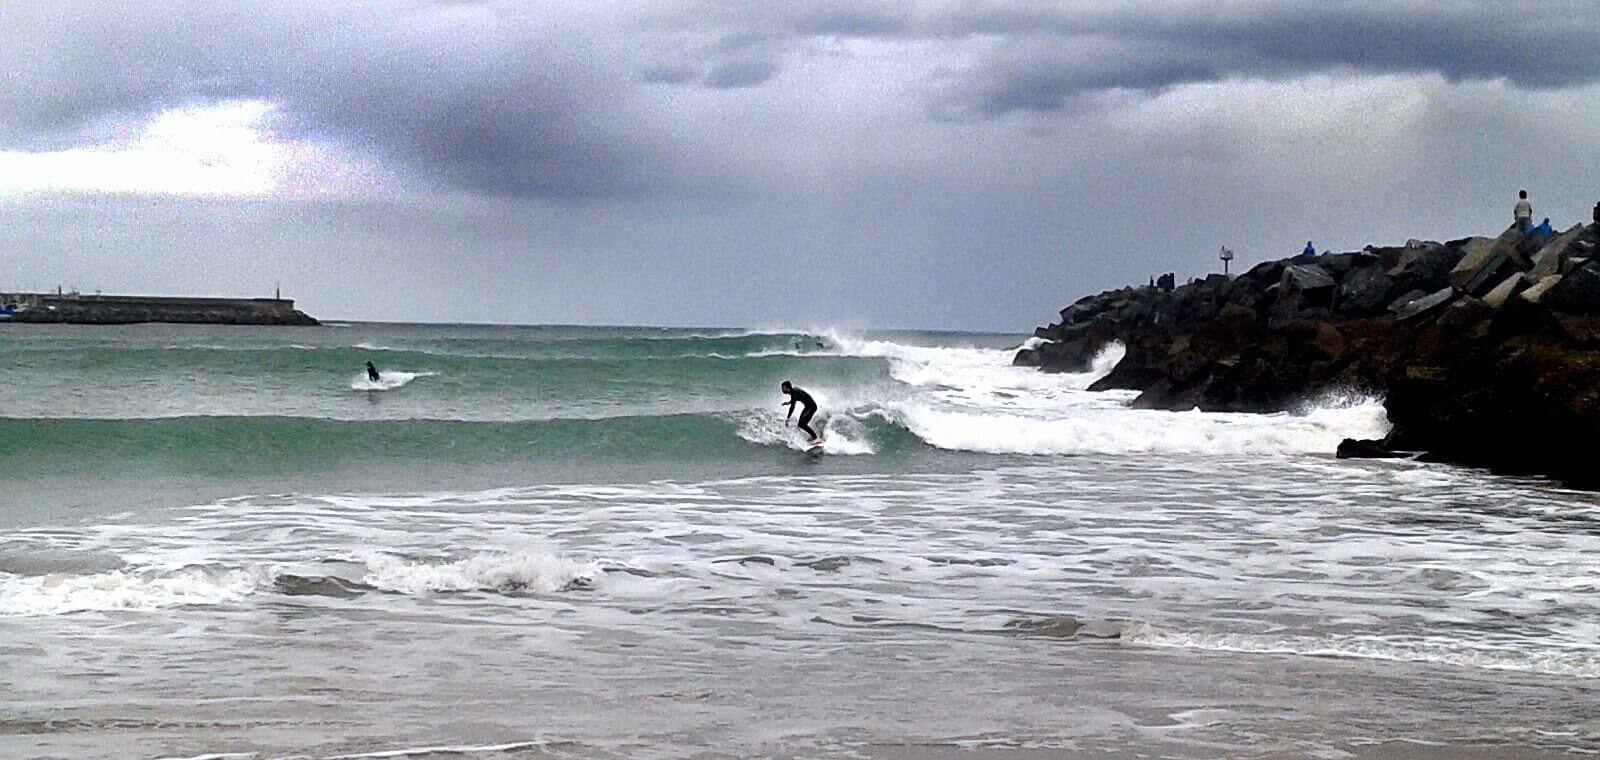 Olas playa de Hondarribia junto al espigón